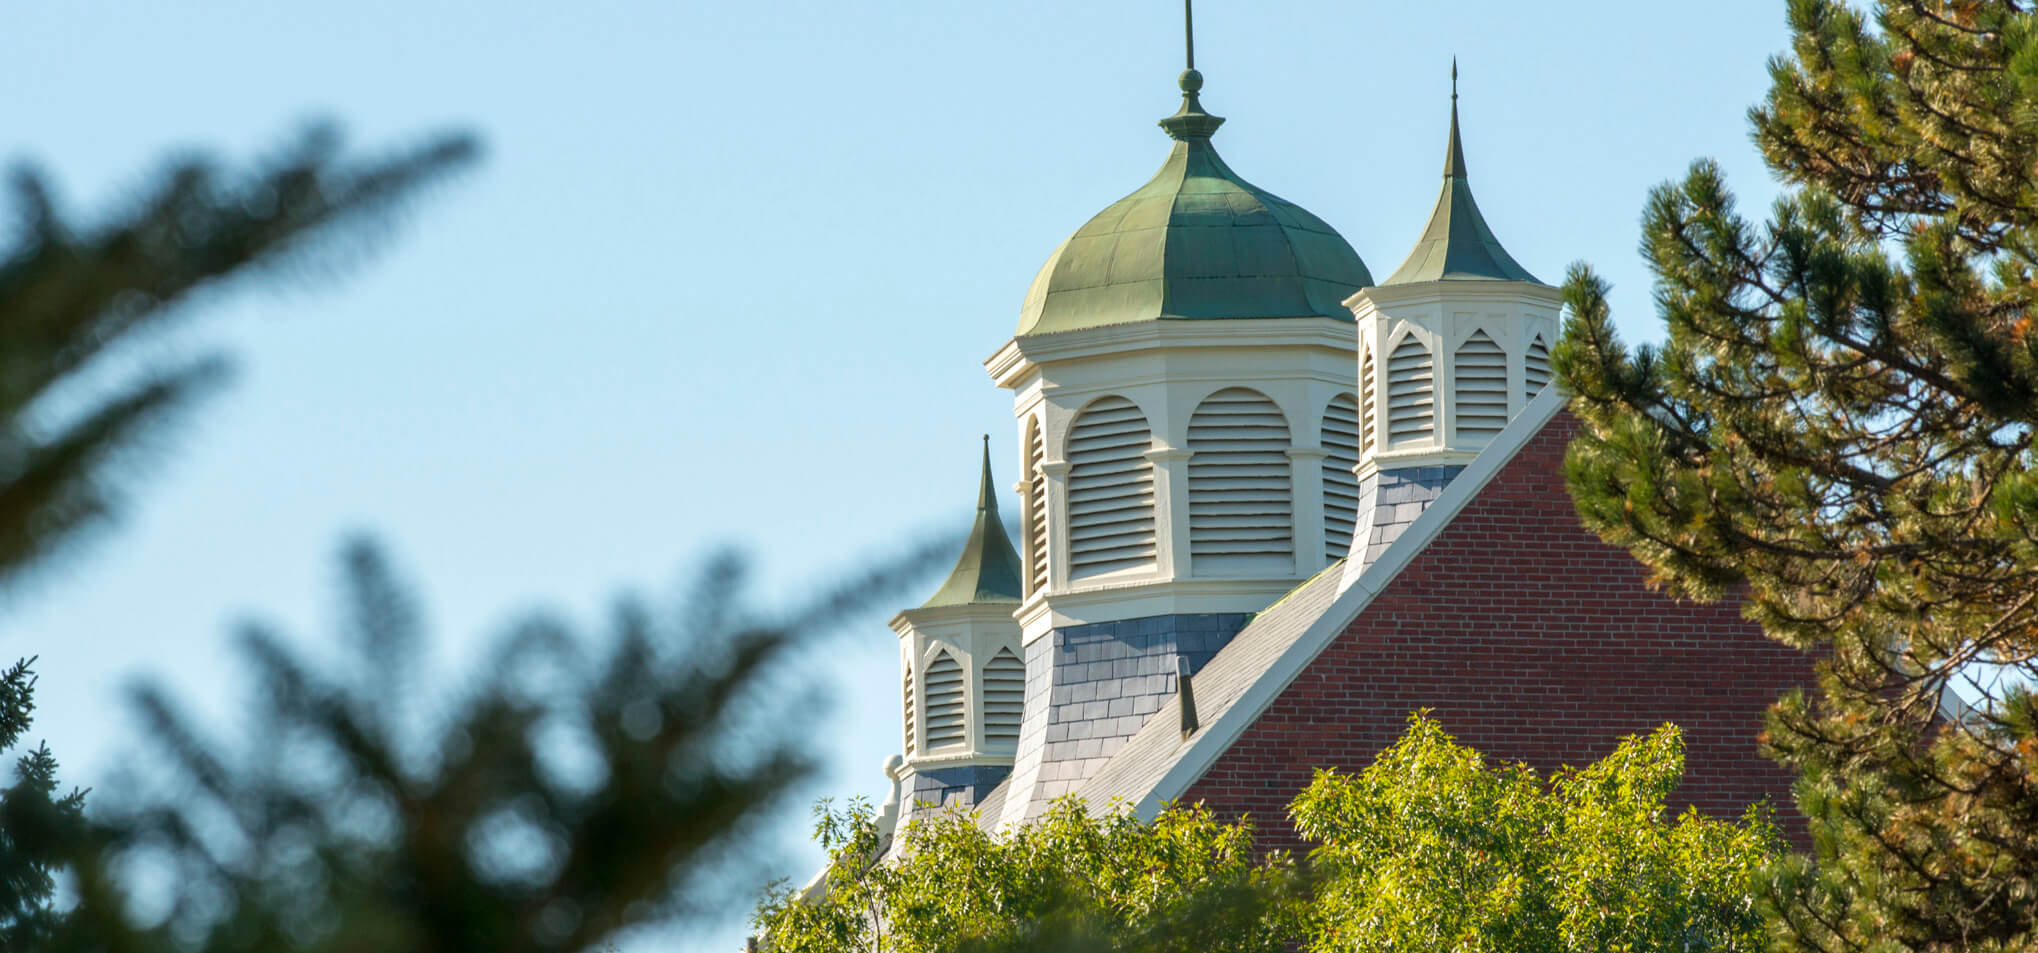 Winslow Hall roofline